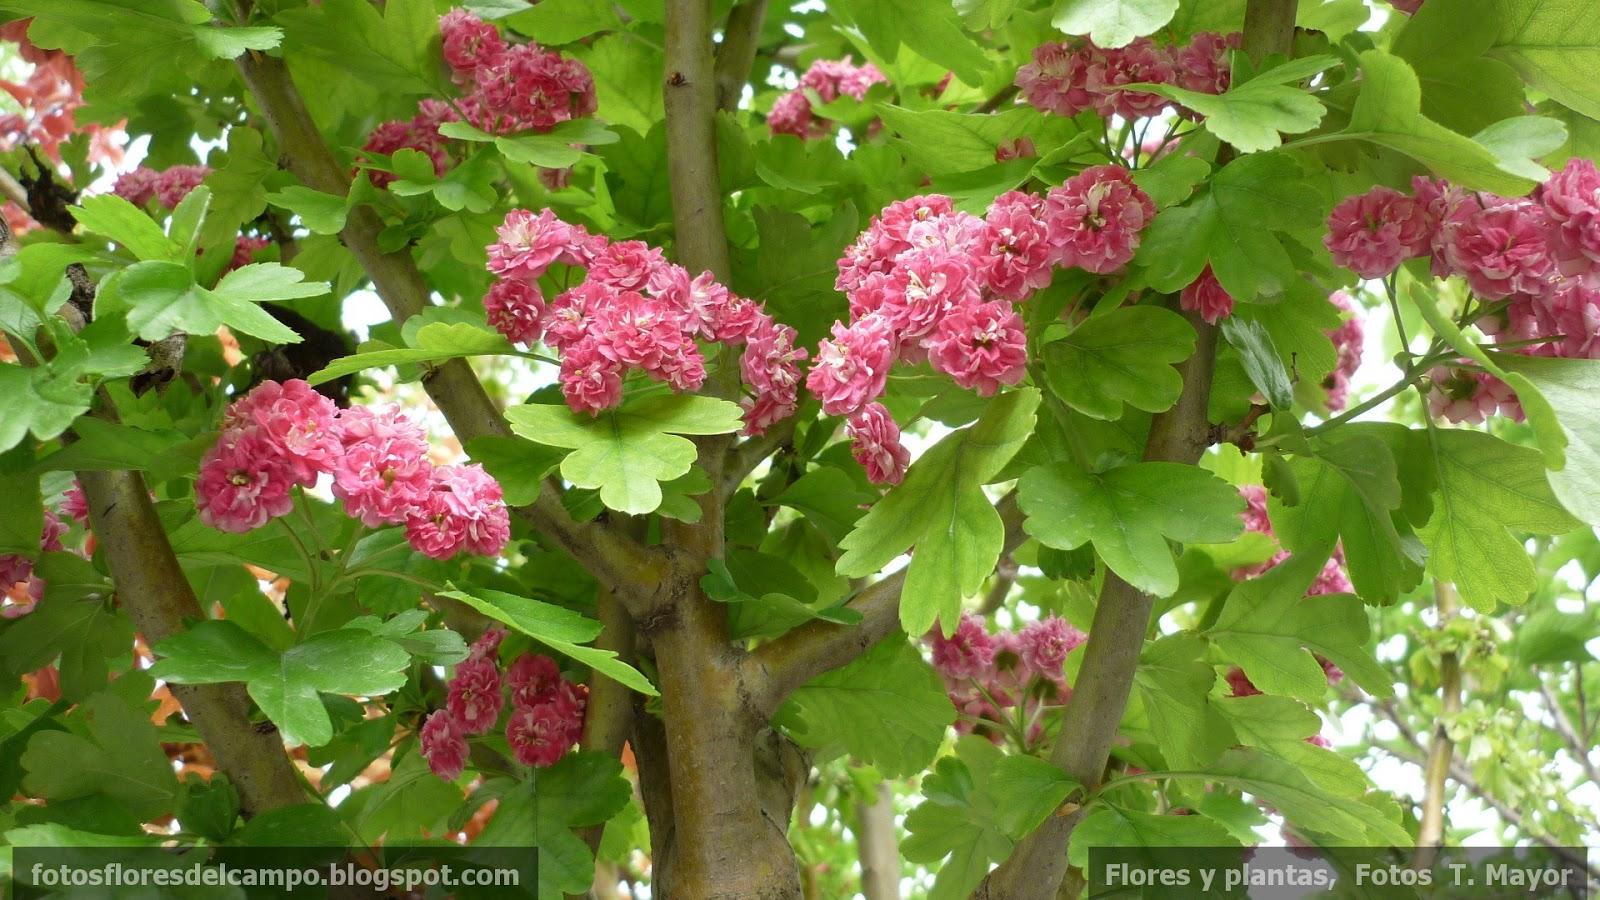 Cephaleuros virescens photos on Flickr | Flickr